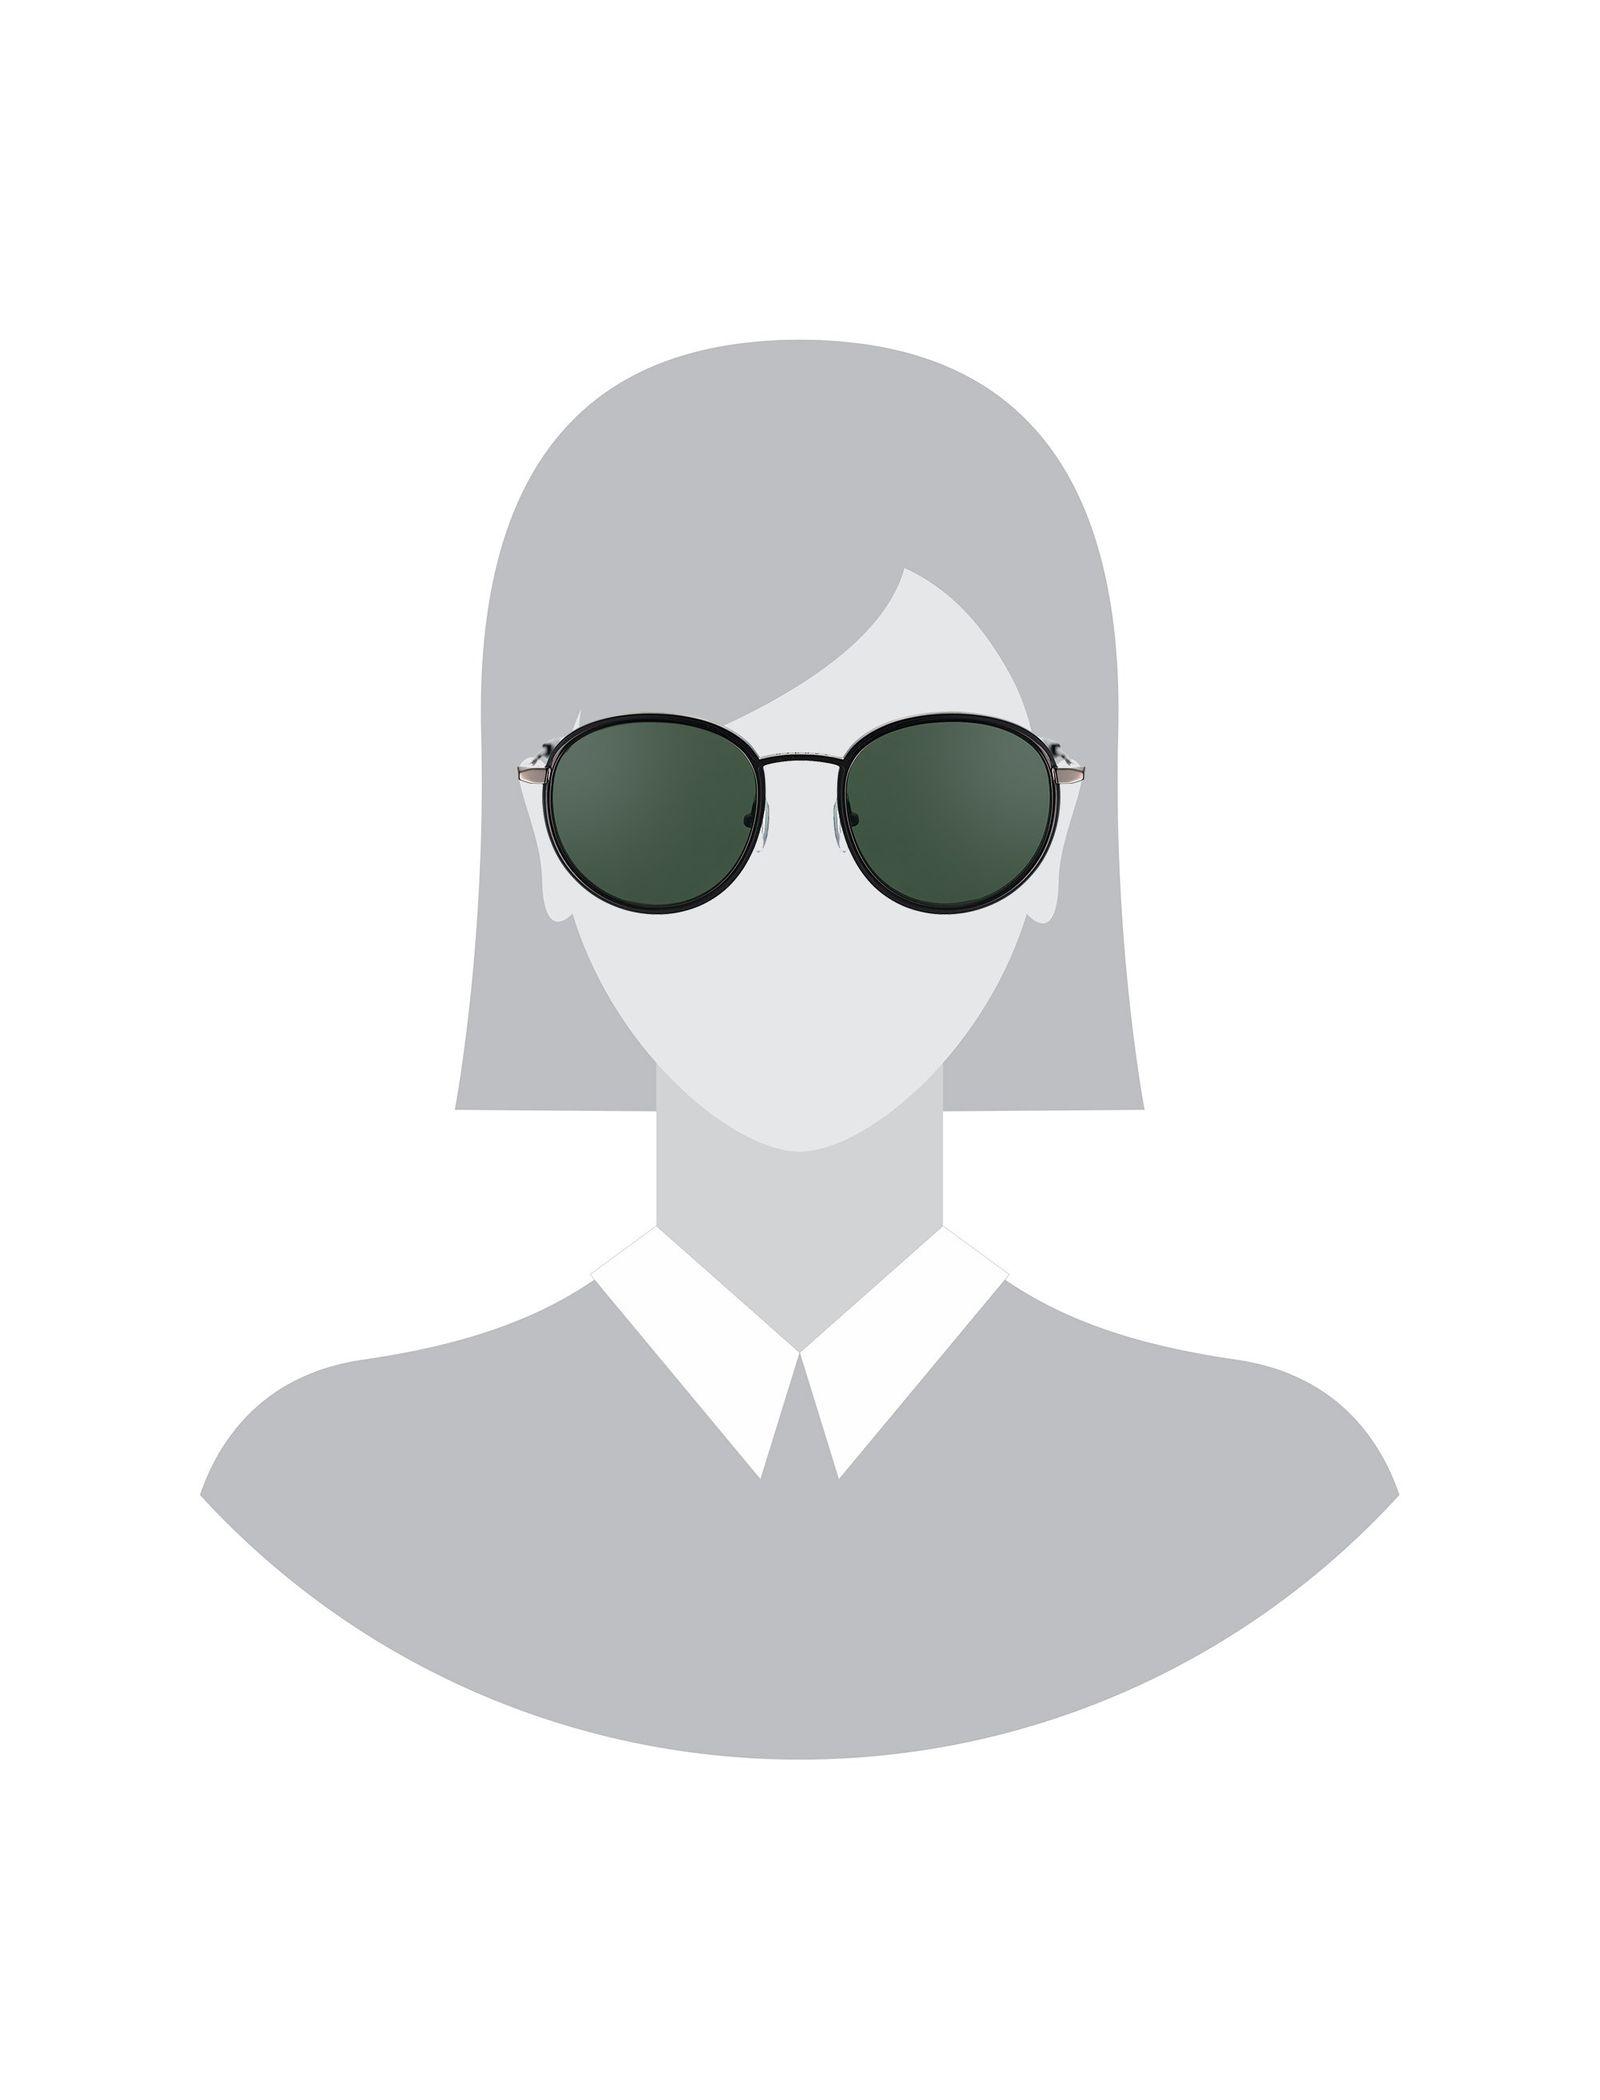 عینک آفتابی گرد زنانه - ساندرو - زغالي      - 5